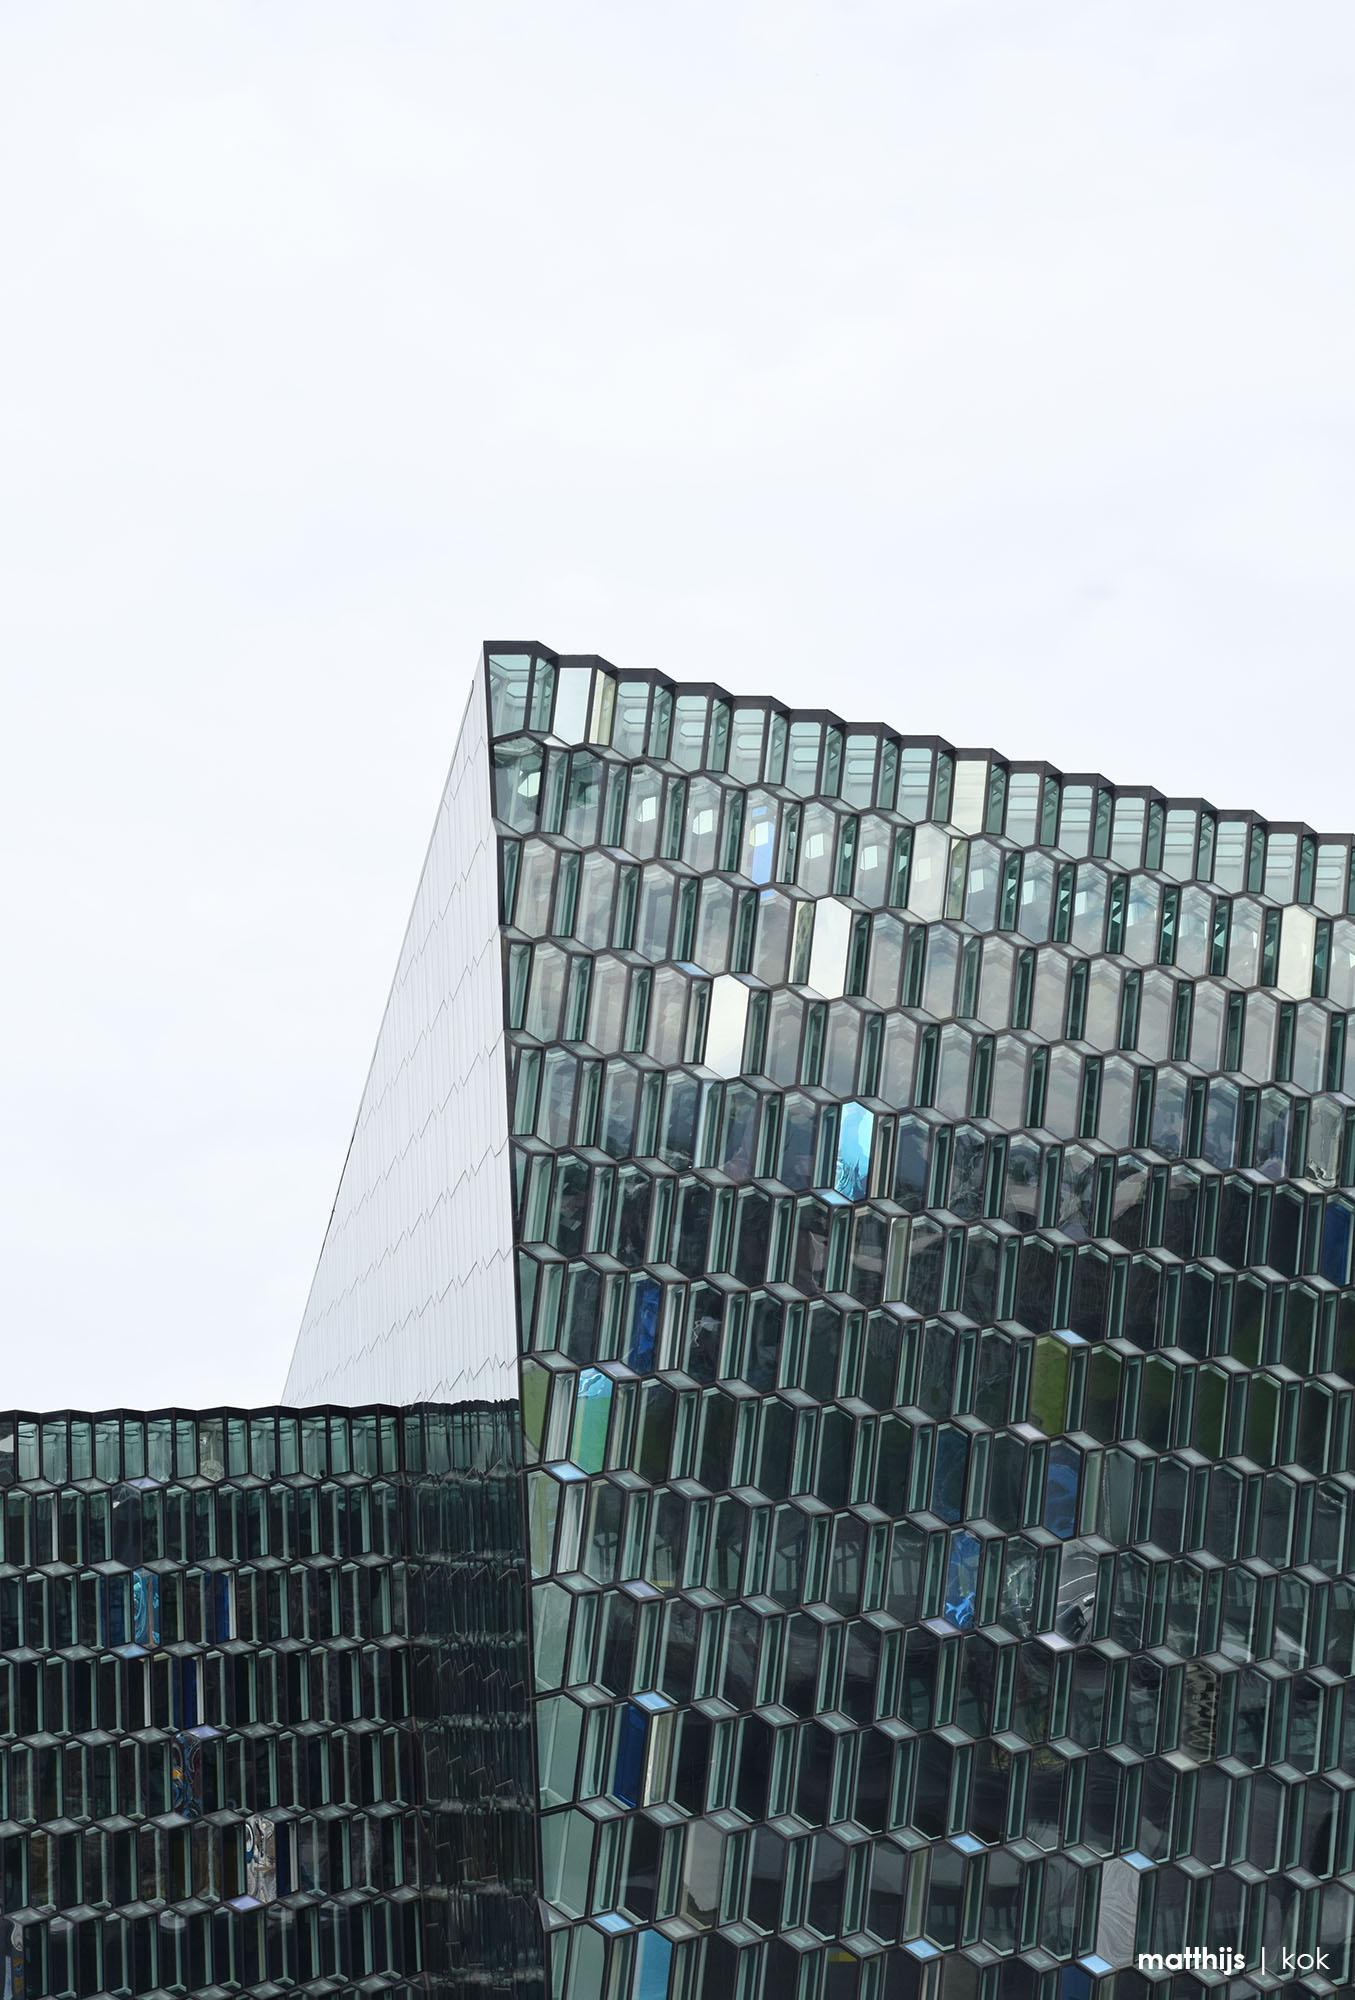 Harpa Reykjavik Concert Hall, Iceland | Photo by Matthijs Kok